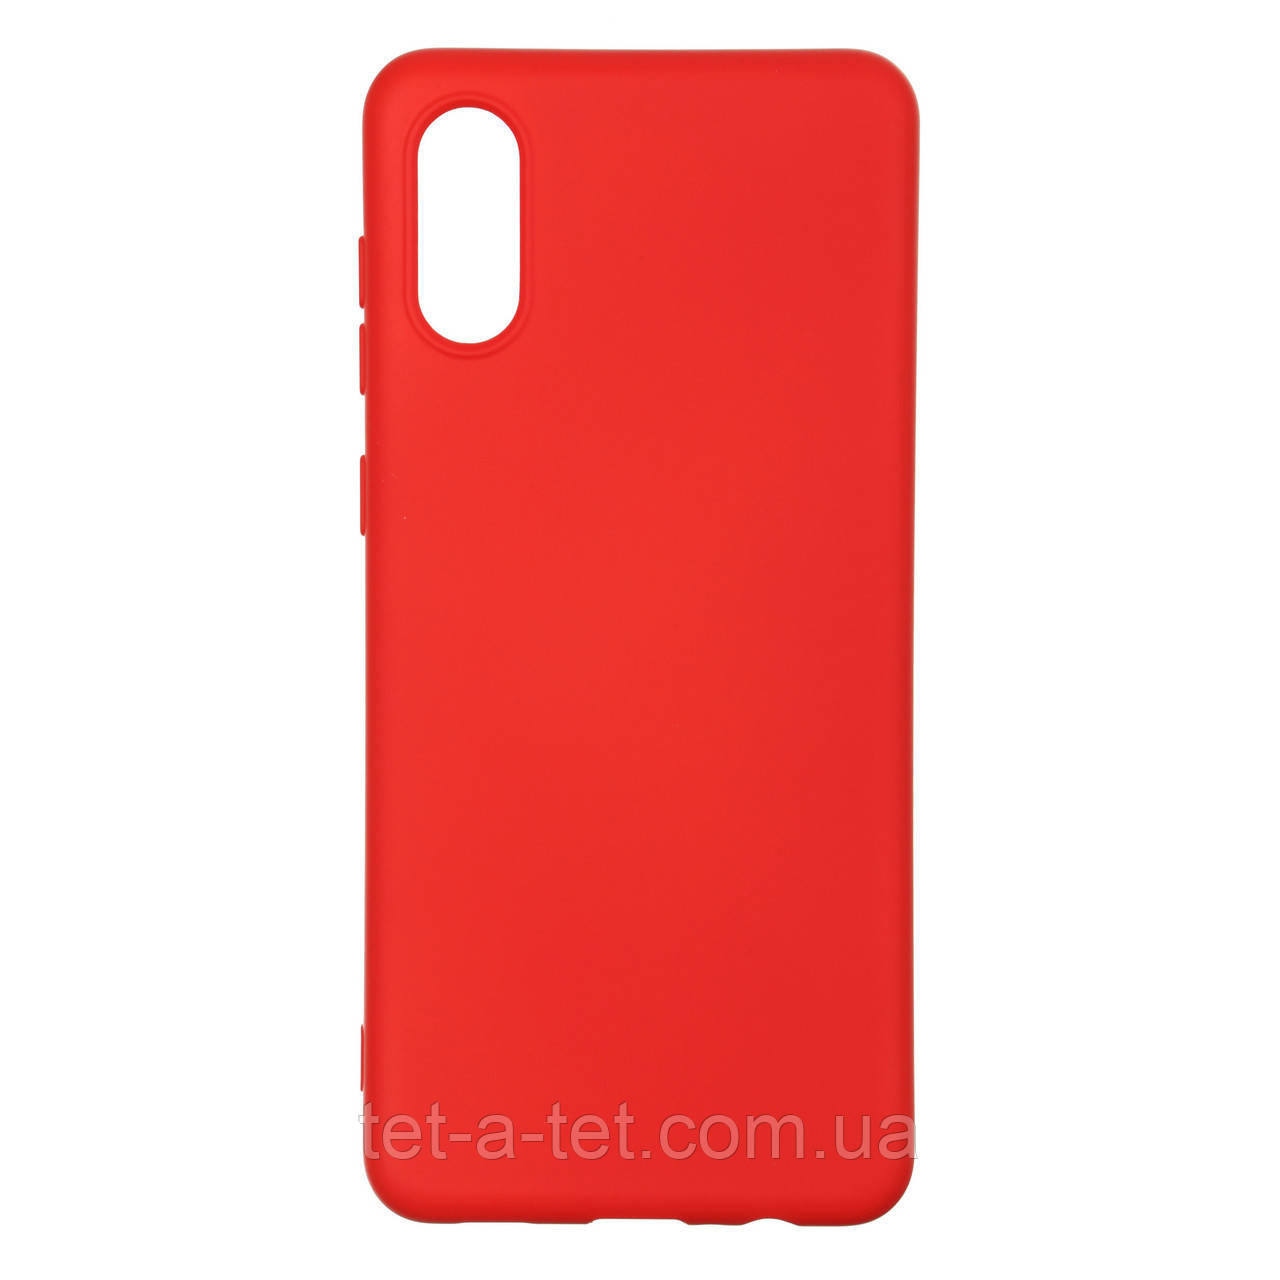 Чехол силиконовый ArmorStandart ICON Case for Samsung A02 (A022) Chili Red